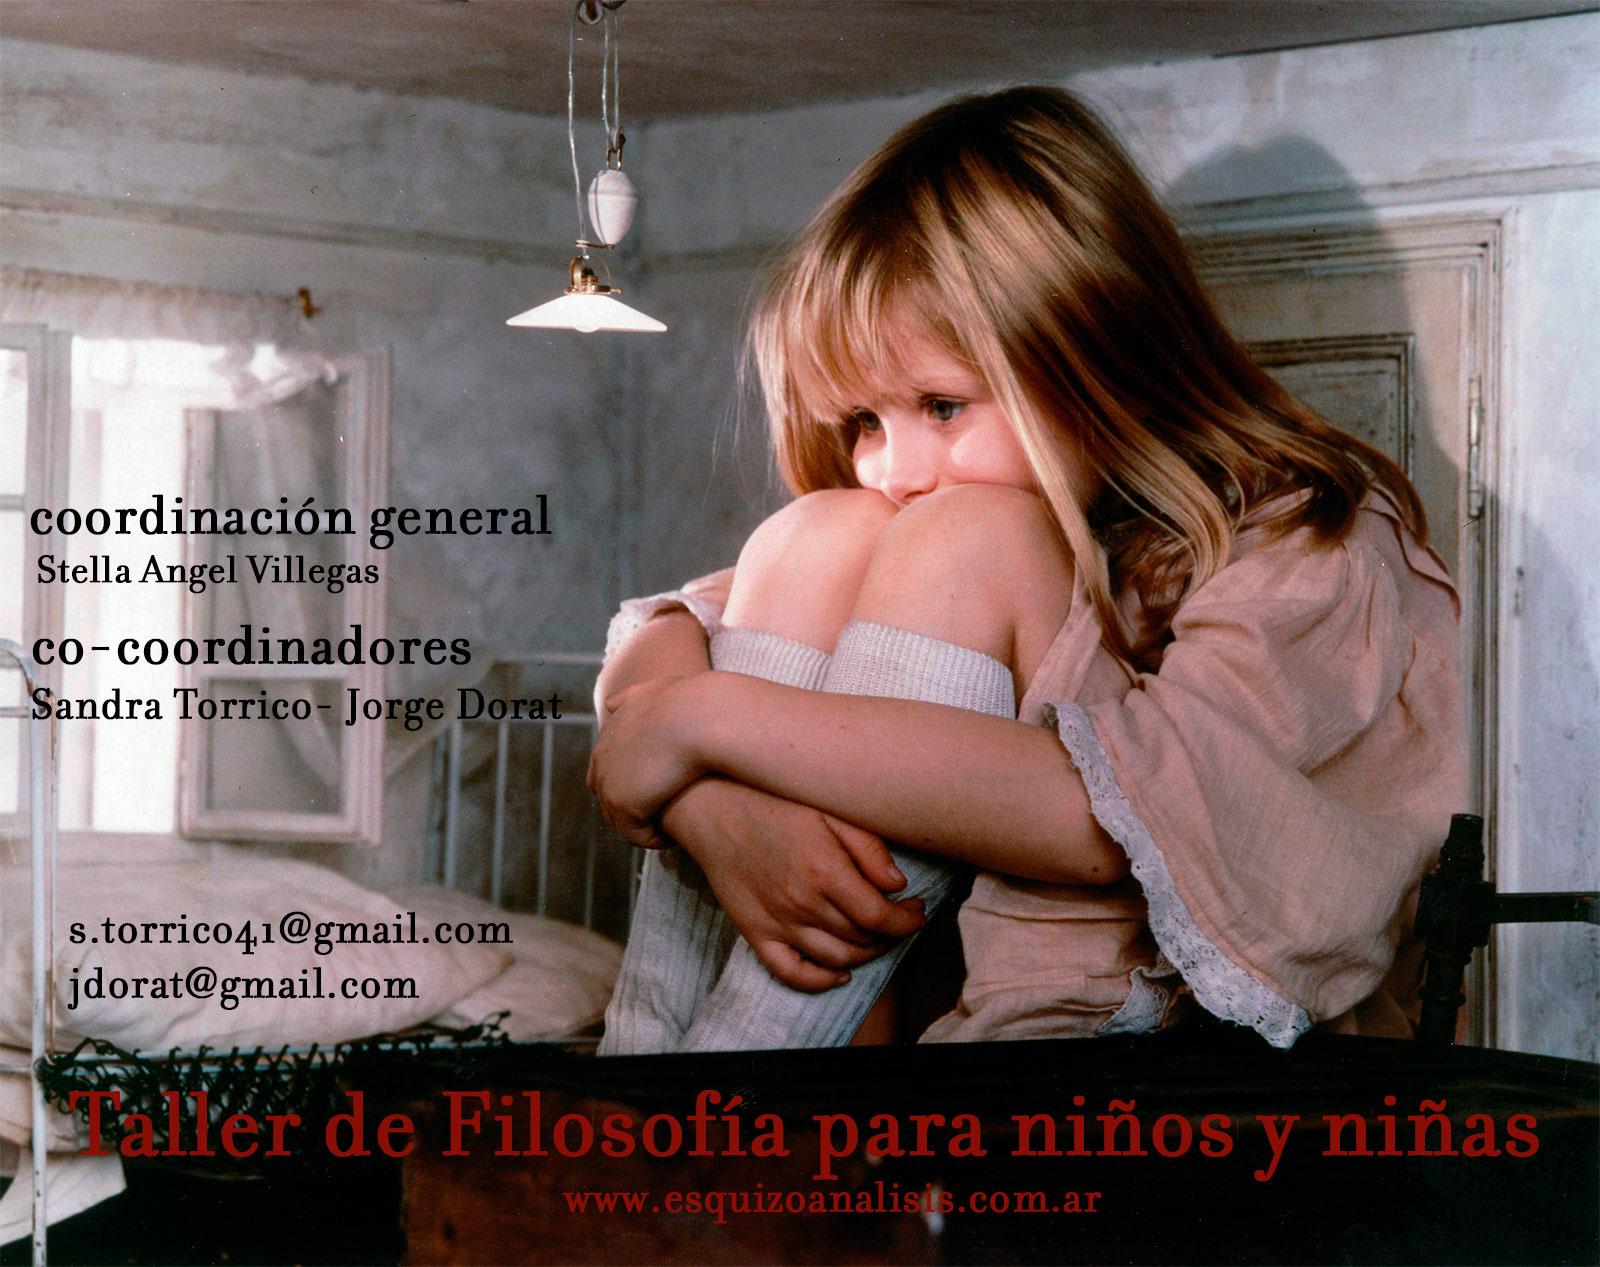 http://medicinayarte.com/img/taller-de-filosofia.jpg